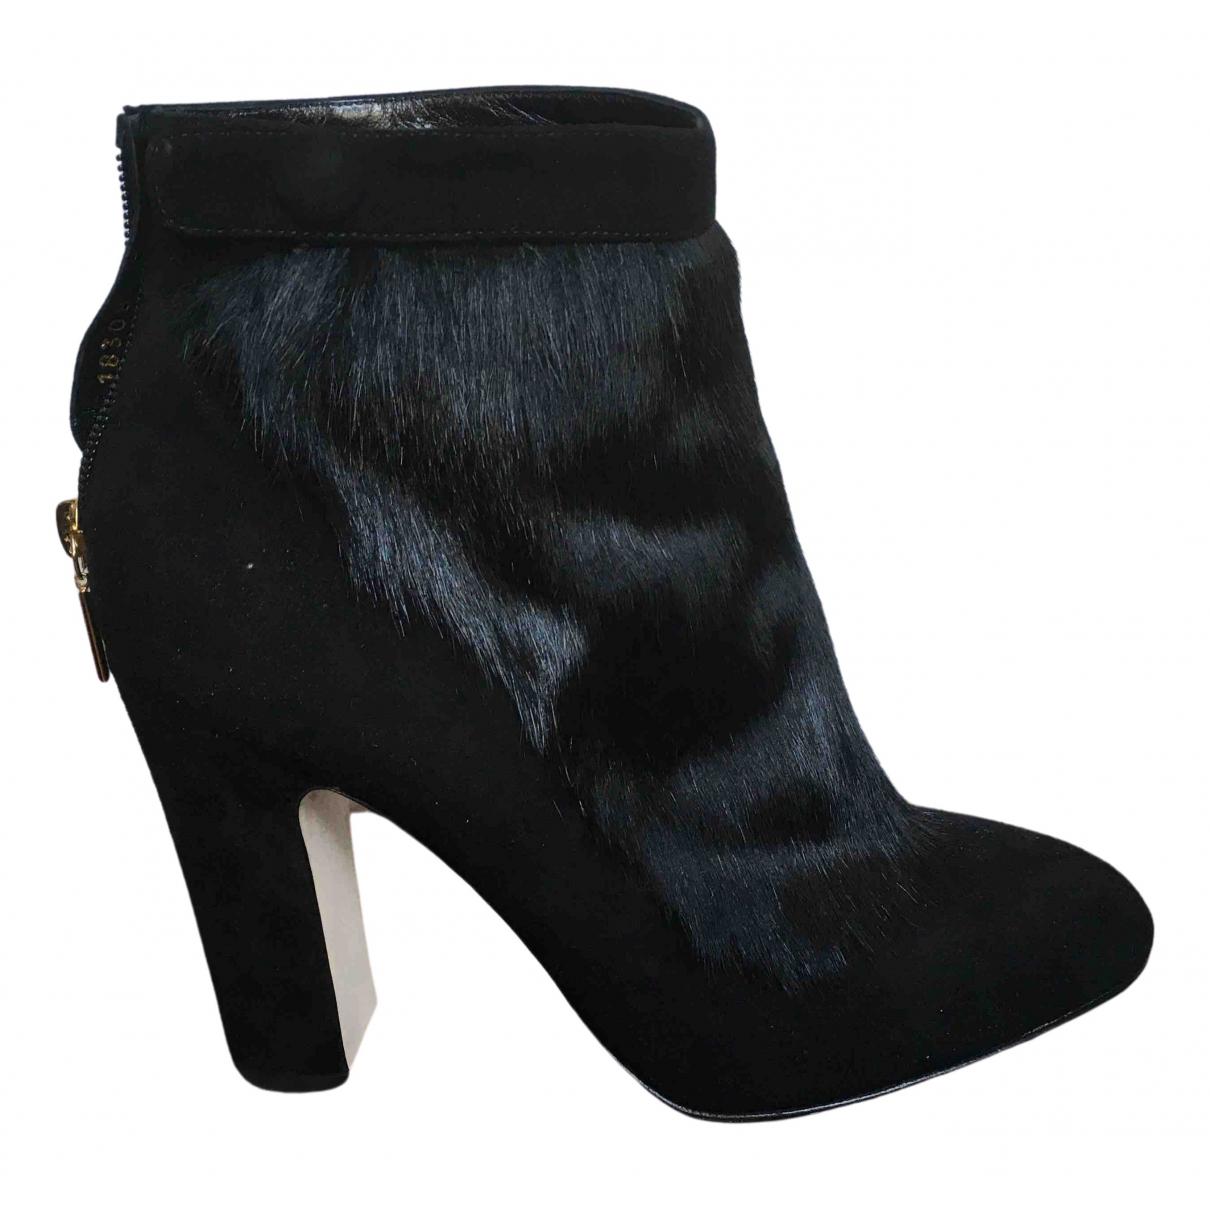 Dolce & Gabbana \N Black Pony-style calfskin Ankle boots for Women 39 EU